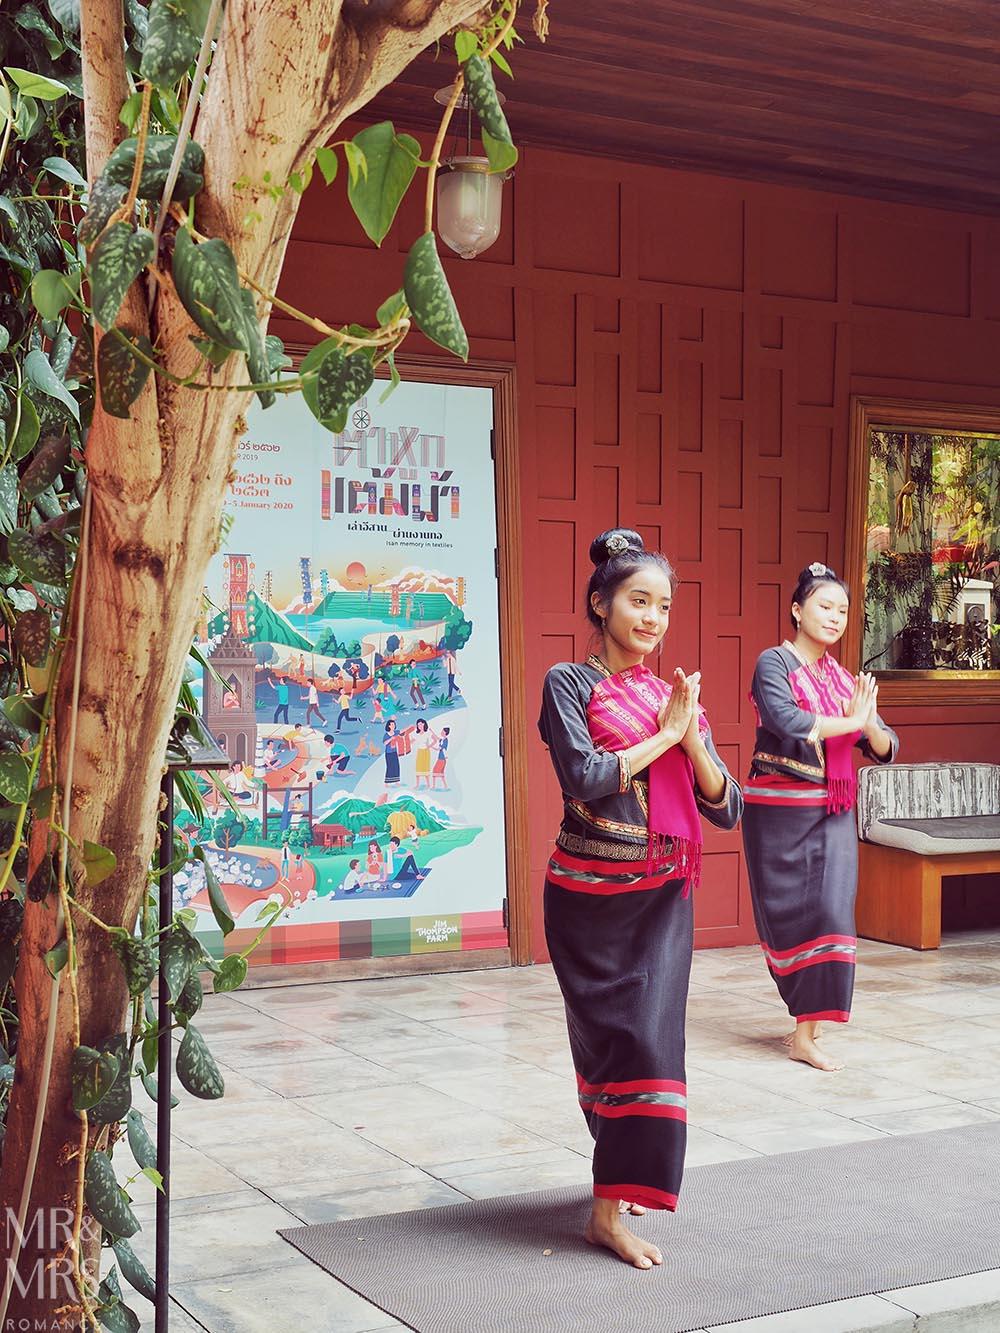 Jim Thompson House, Bangkok - dancing